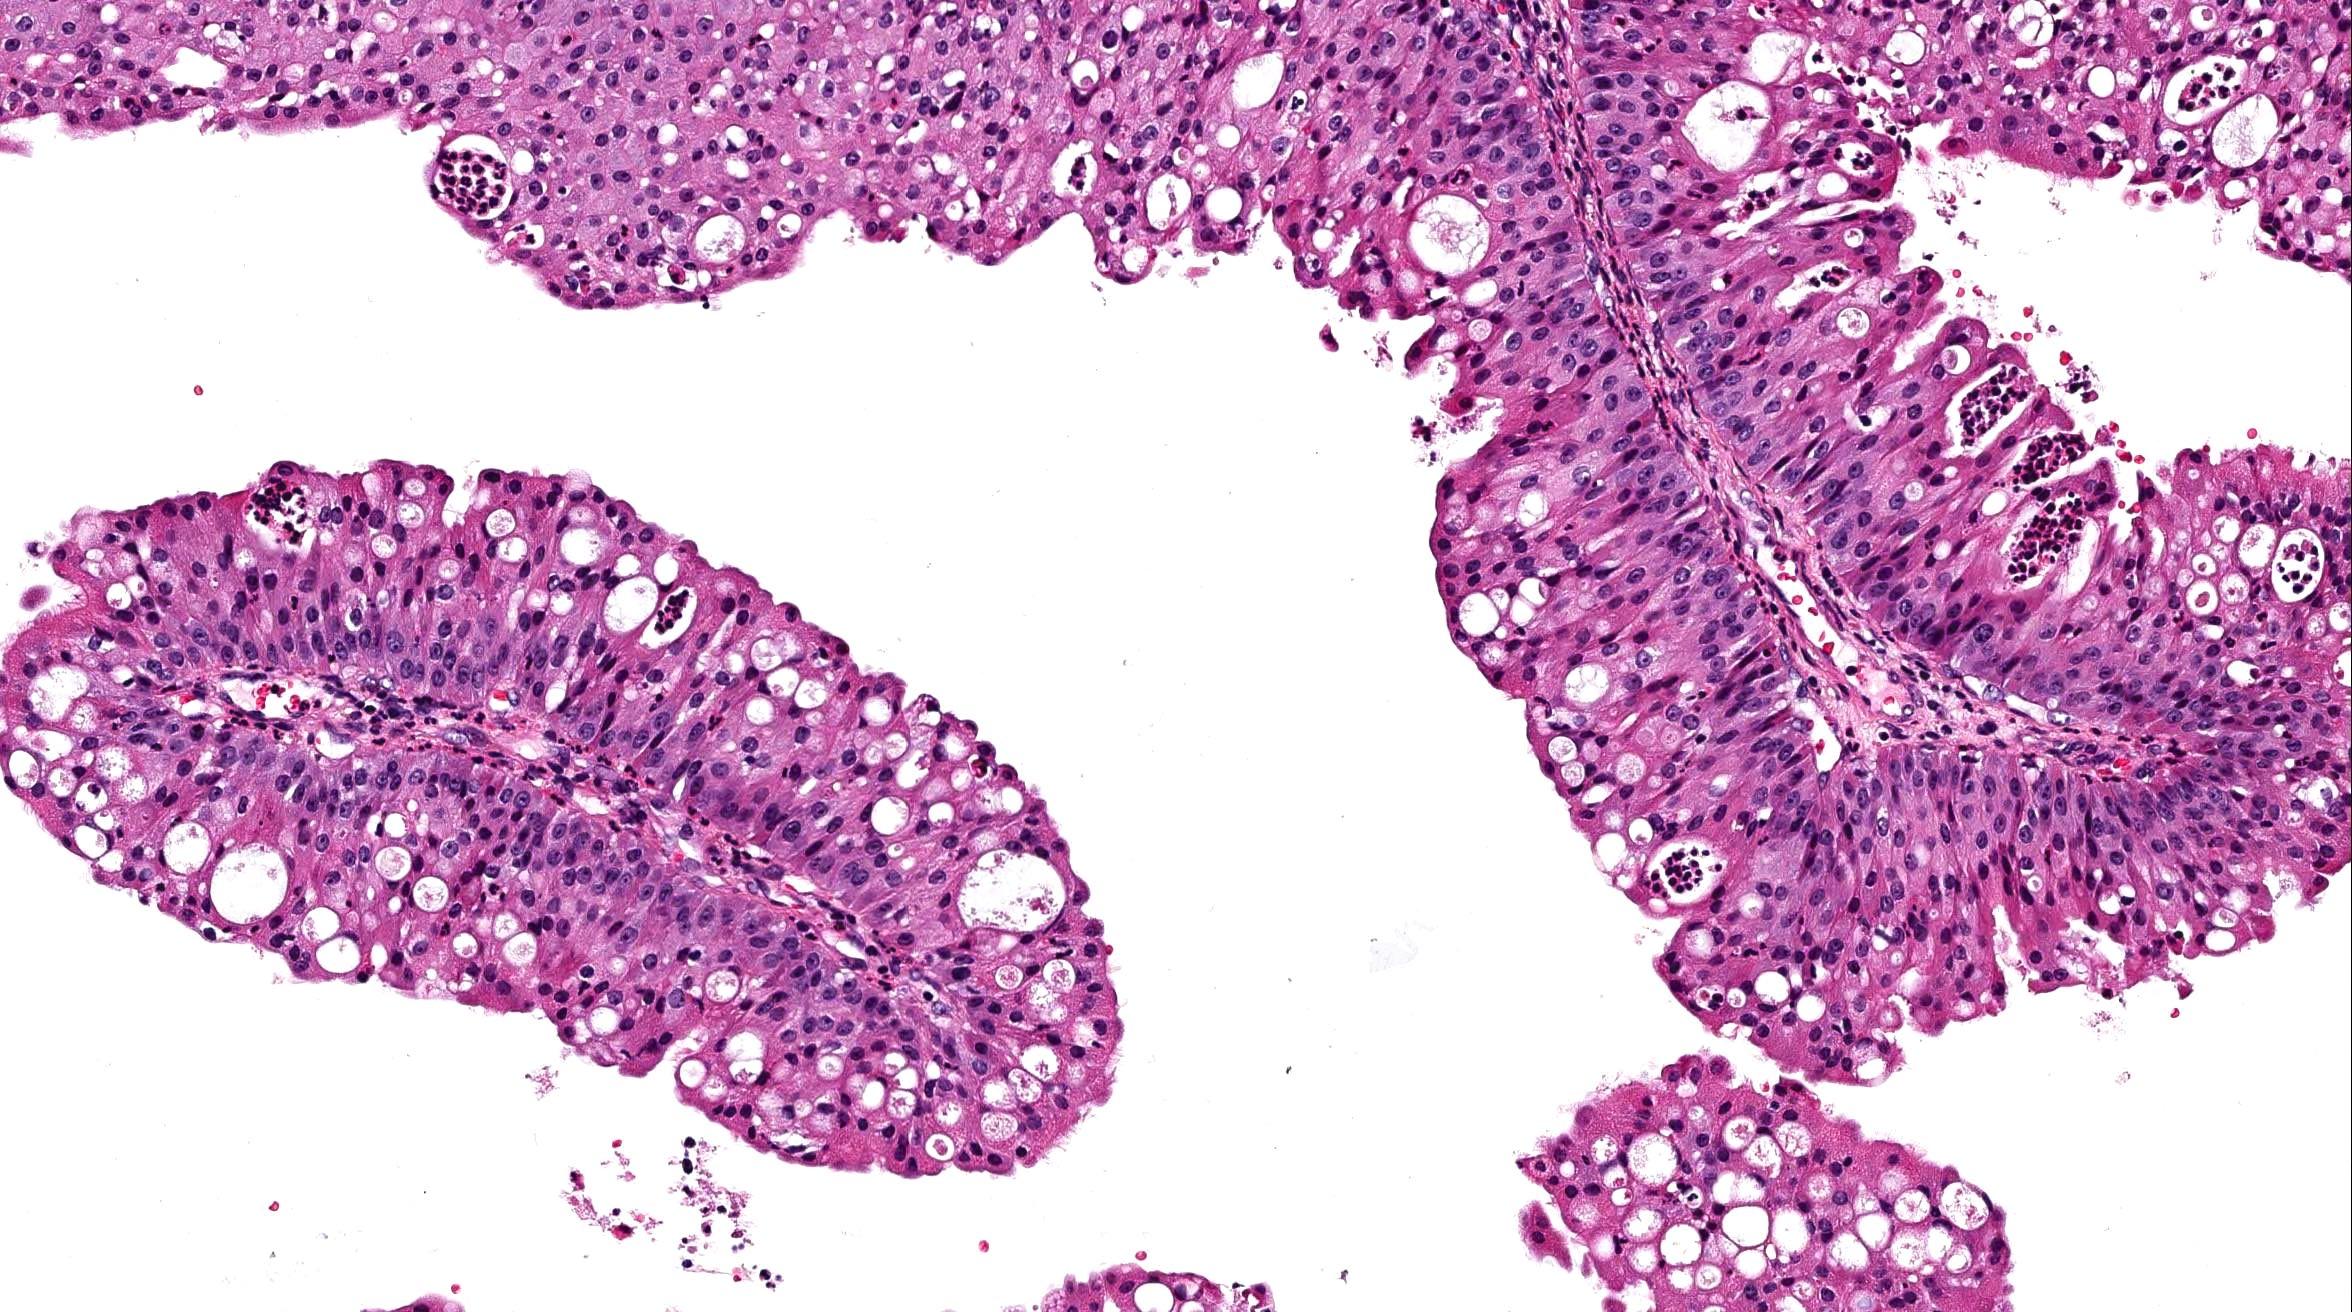 inverted papilloma nasal cavity pathology outlines misconception human papillomavirus vaccine and infertility